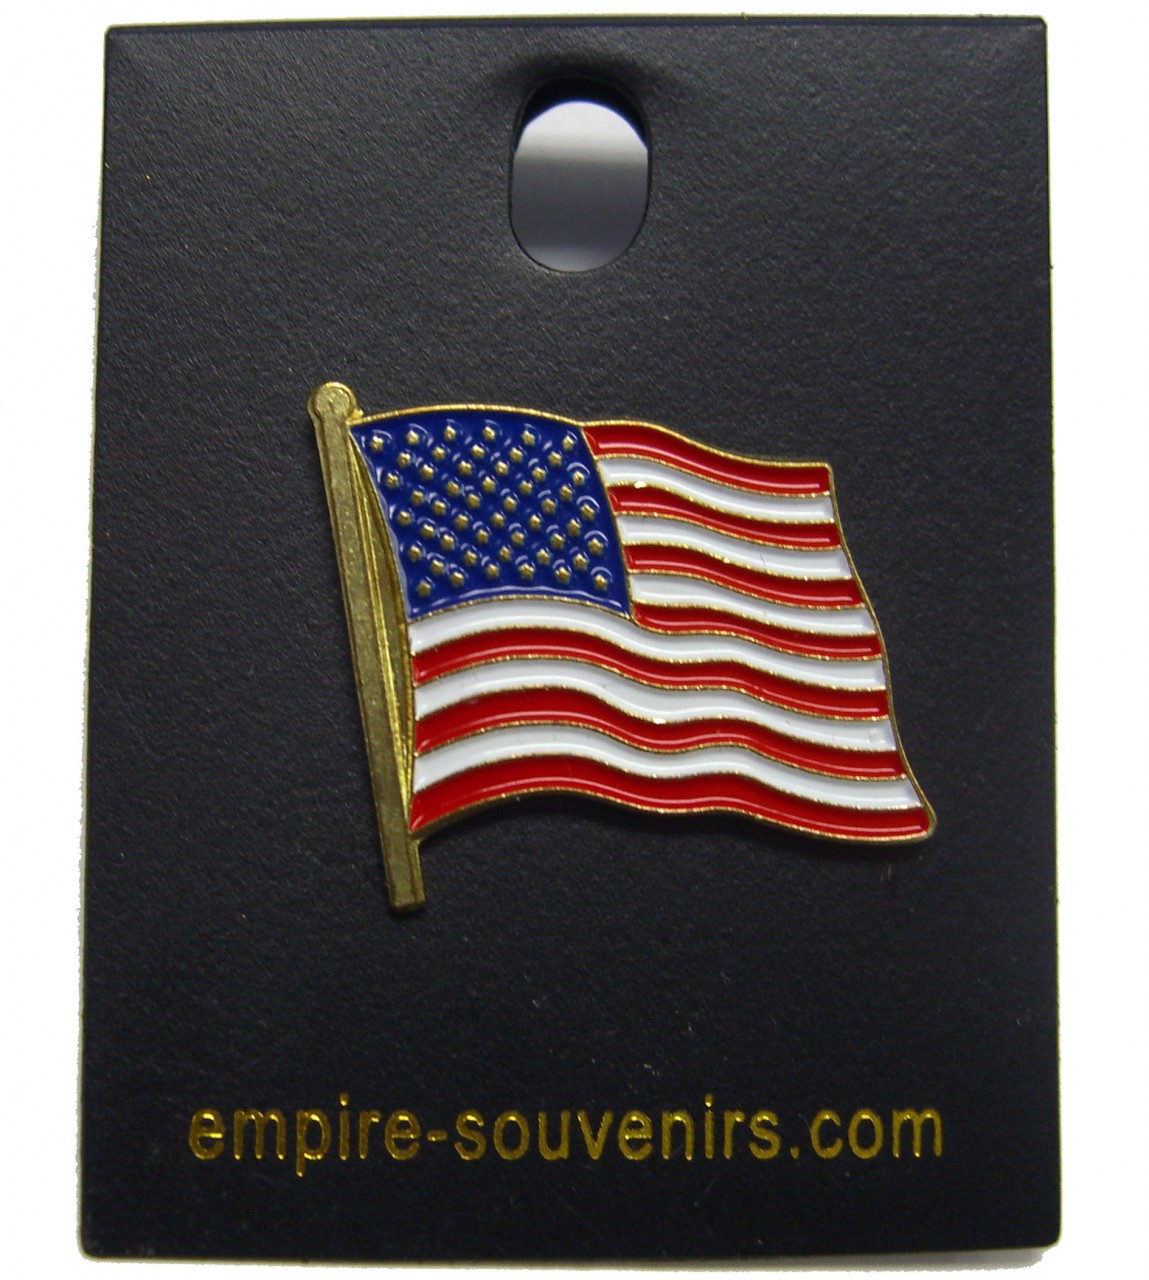 USA Flag Lapel Pin - American Flag Pin photo